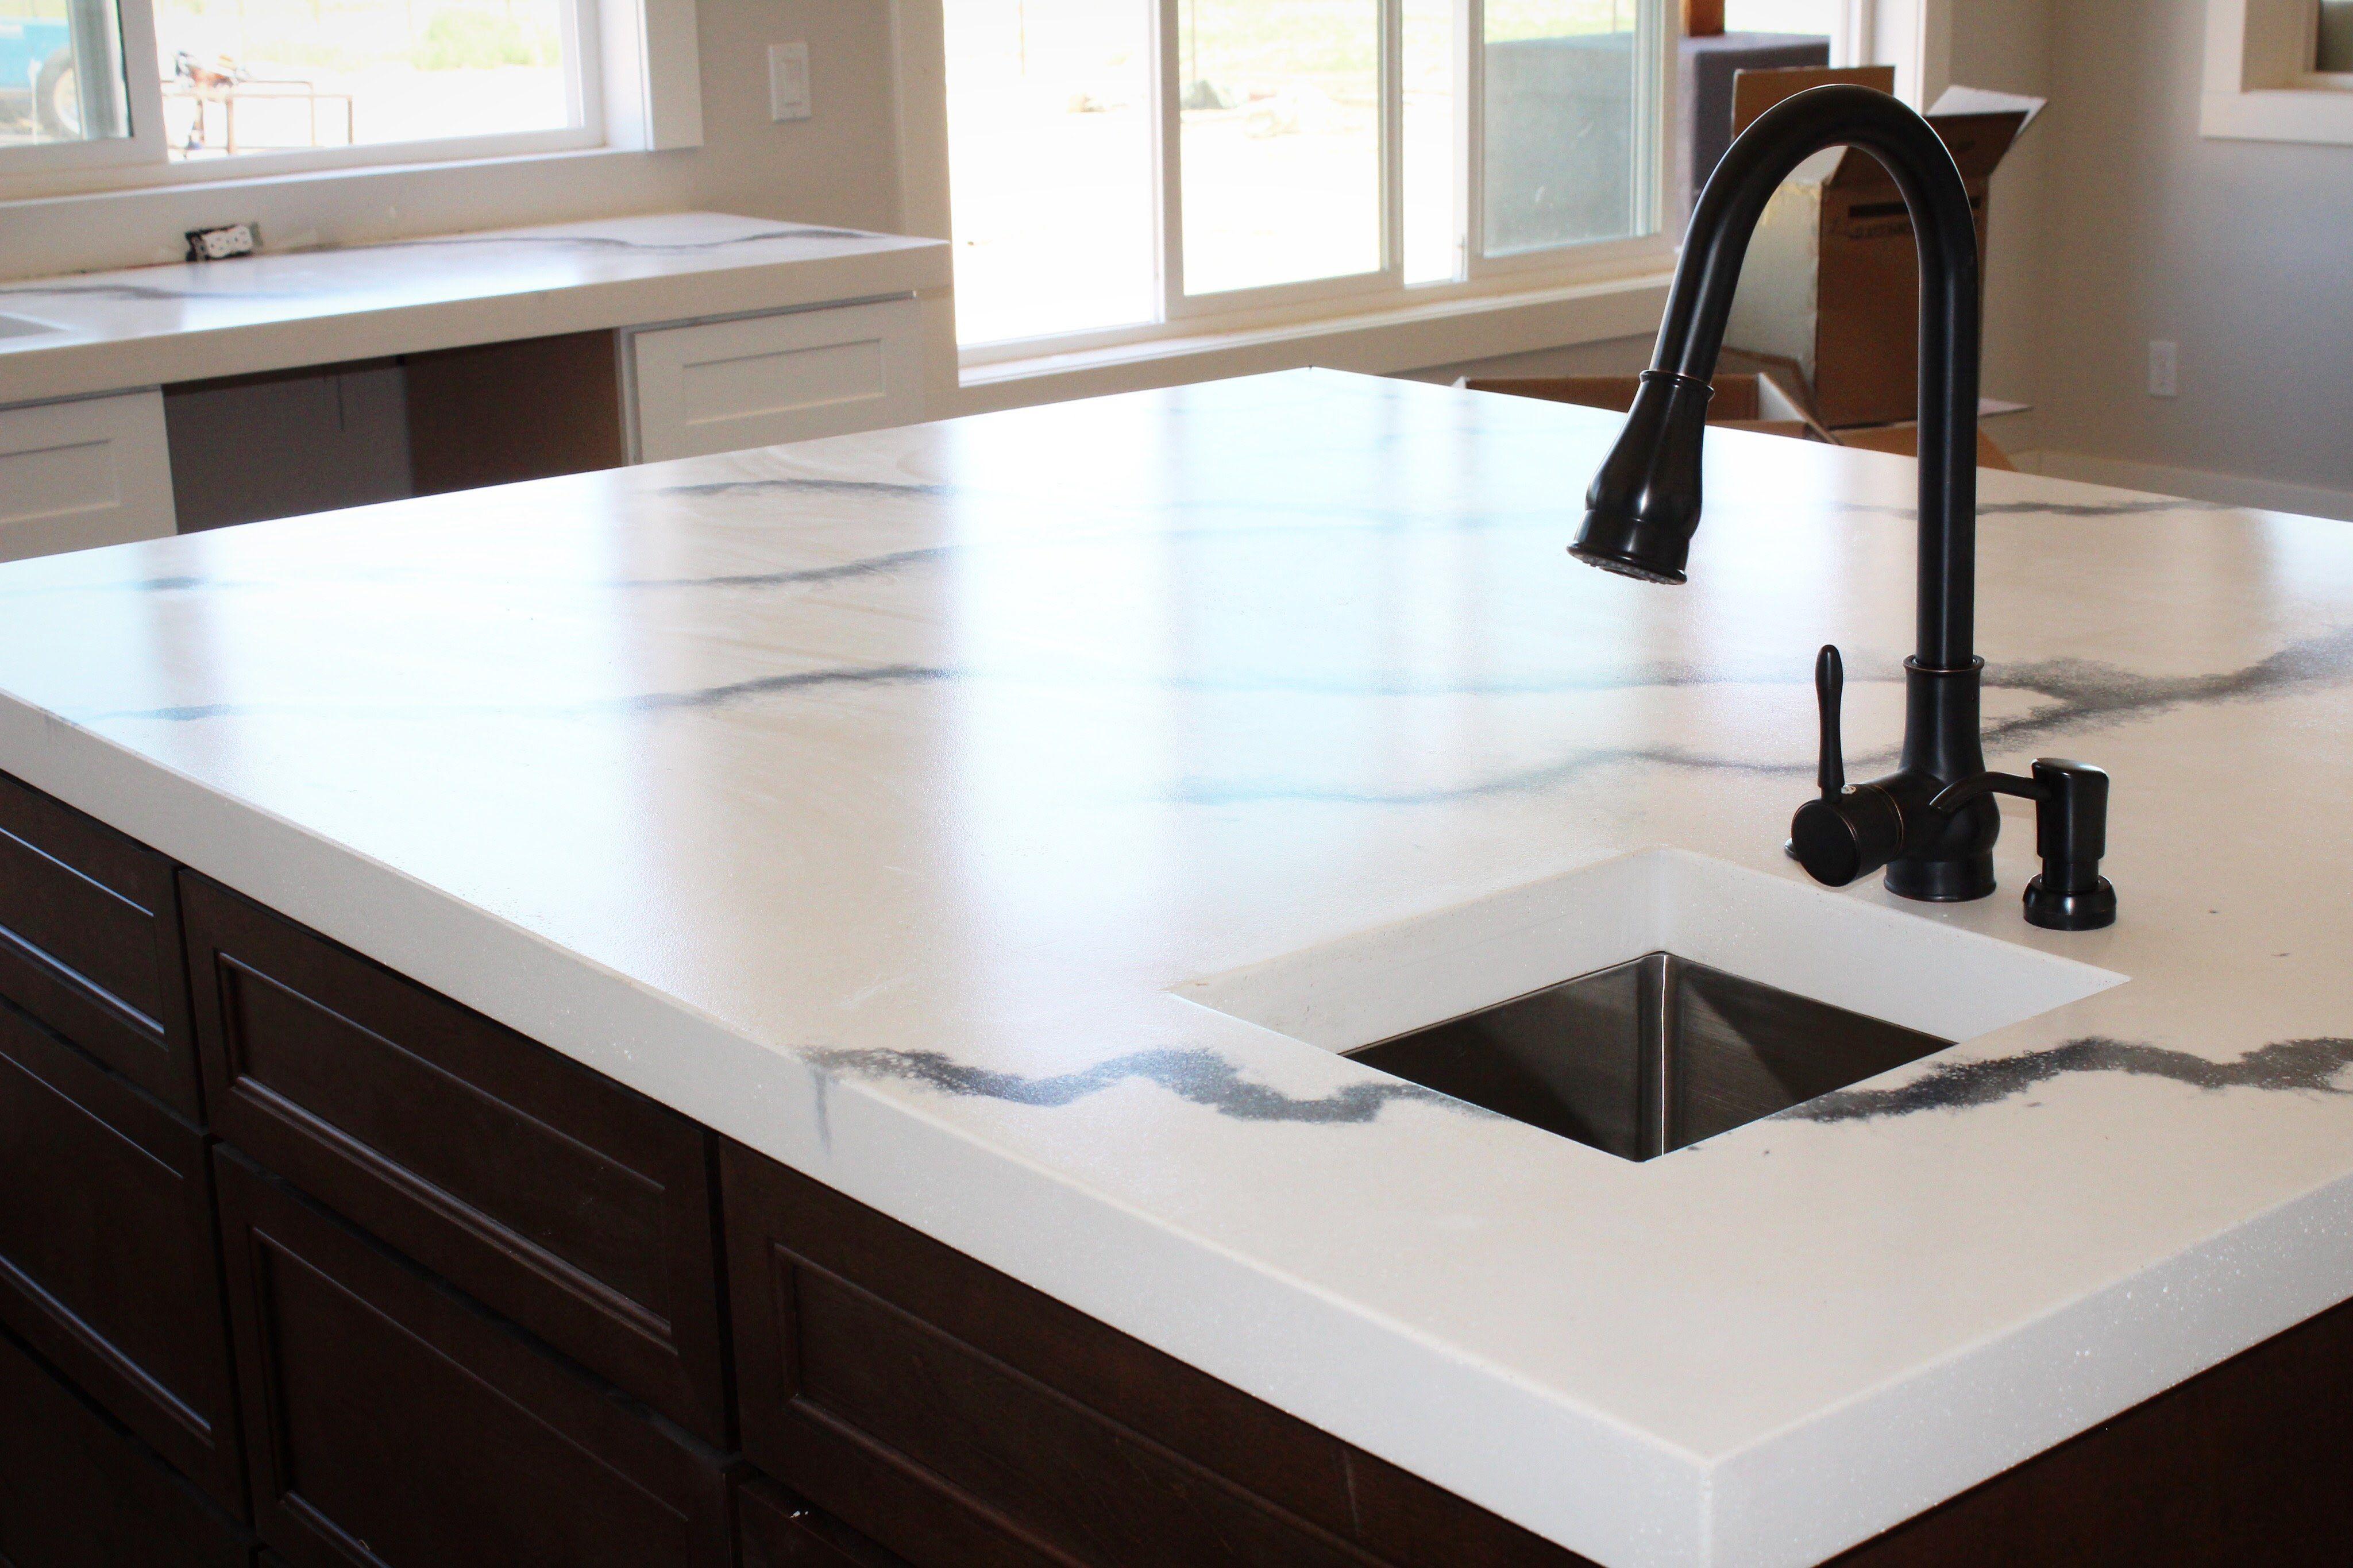 kitchen express quartz vs poltaniu inspirational of granite countertops phoenix marble concrete new pictures